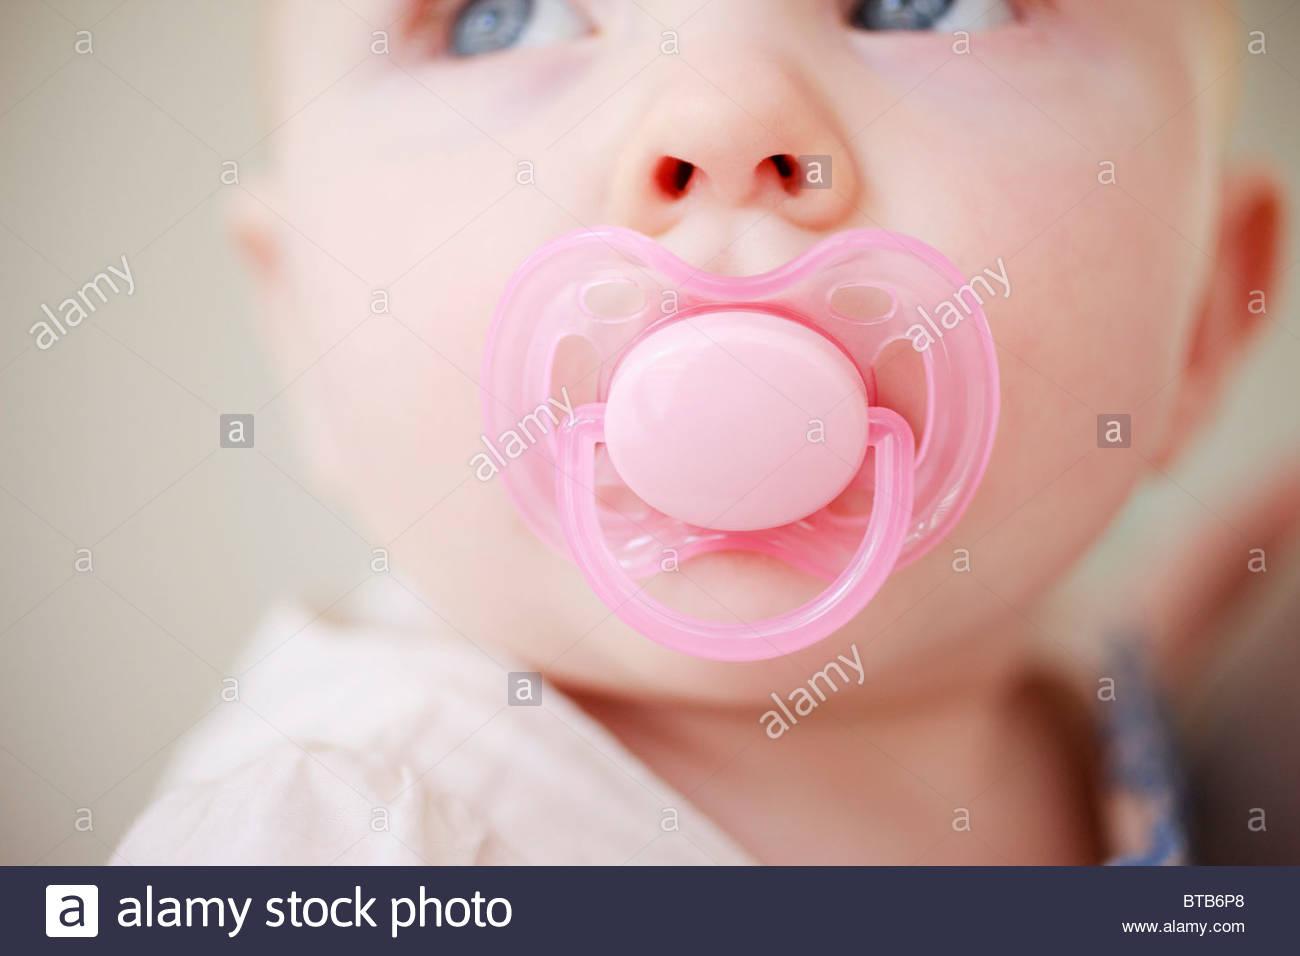 Cerca del bebé con chupete rosa Imagen De Stock